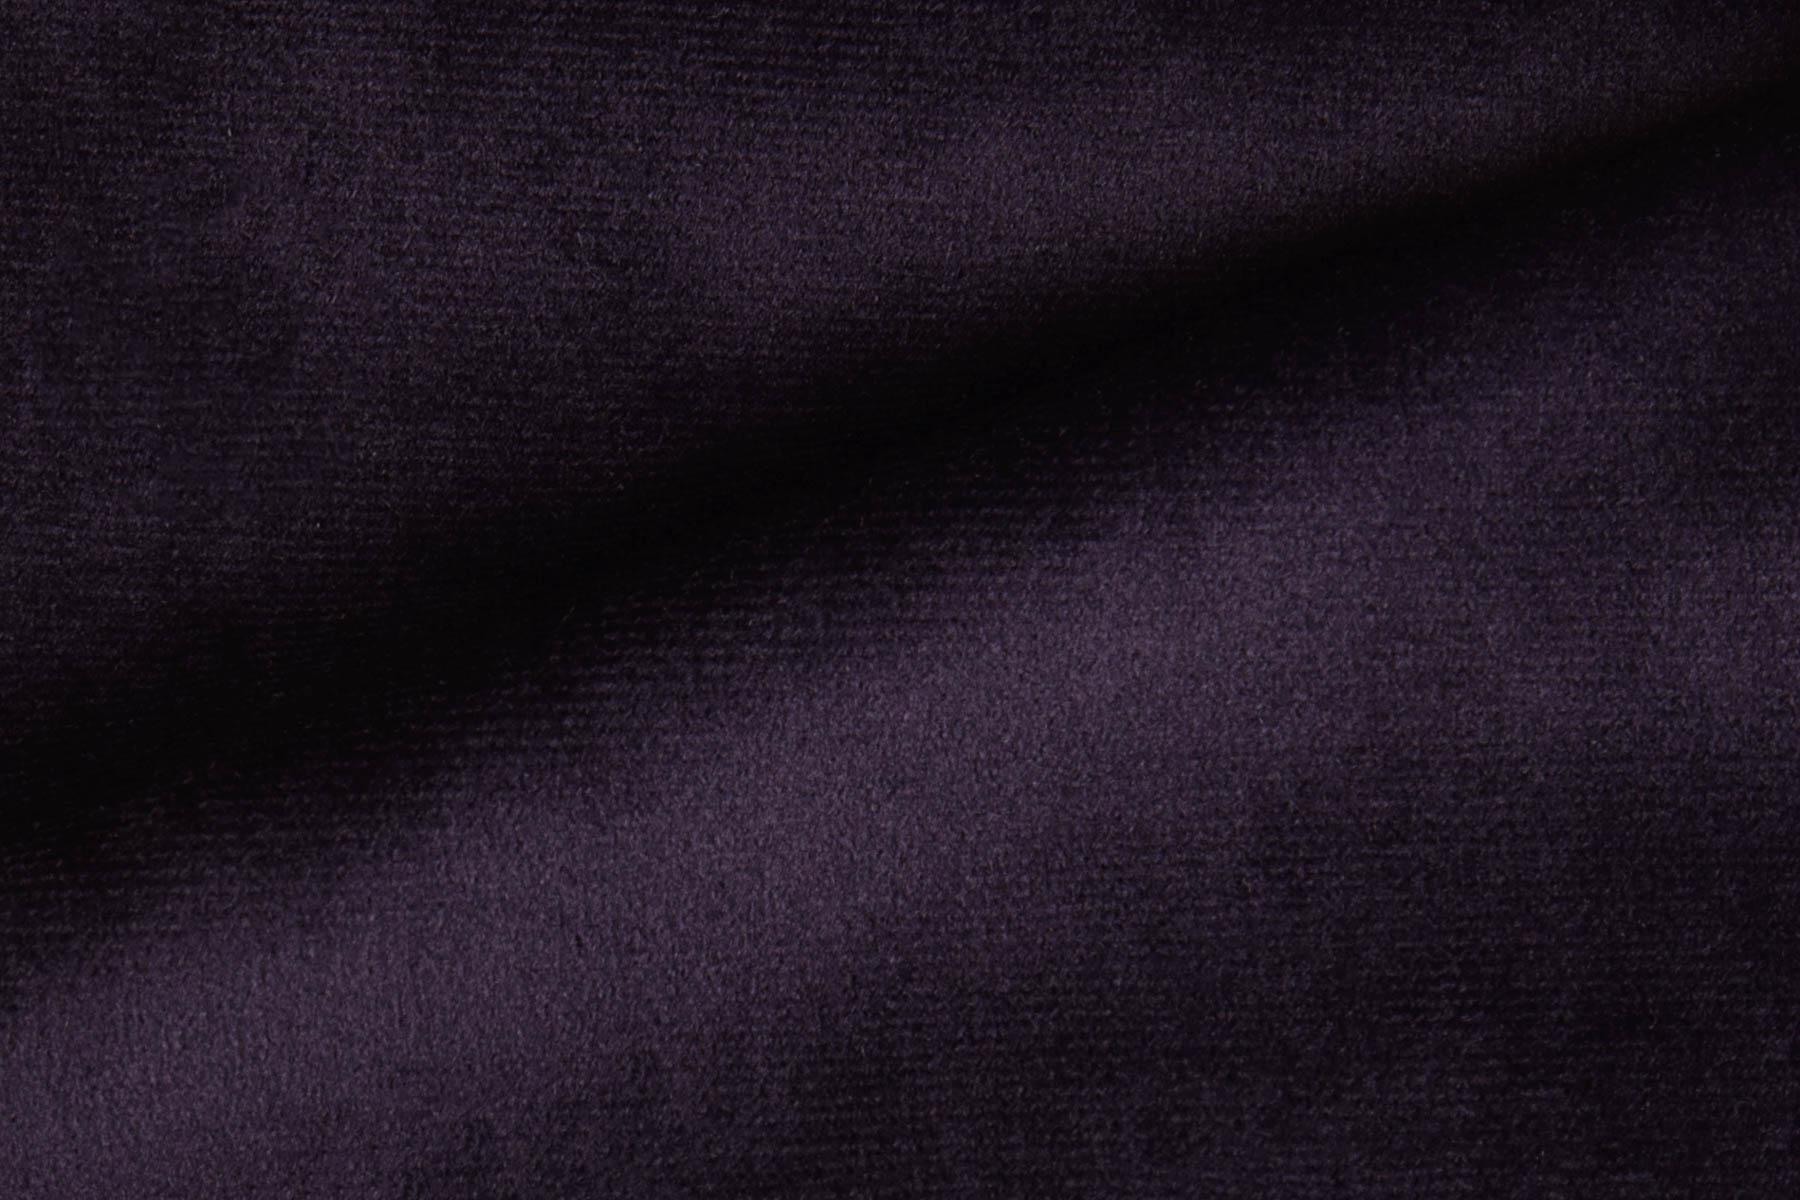 Fabric Radiance Velvet Deep Purple By Koket